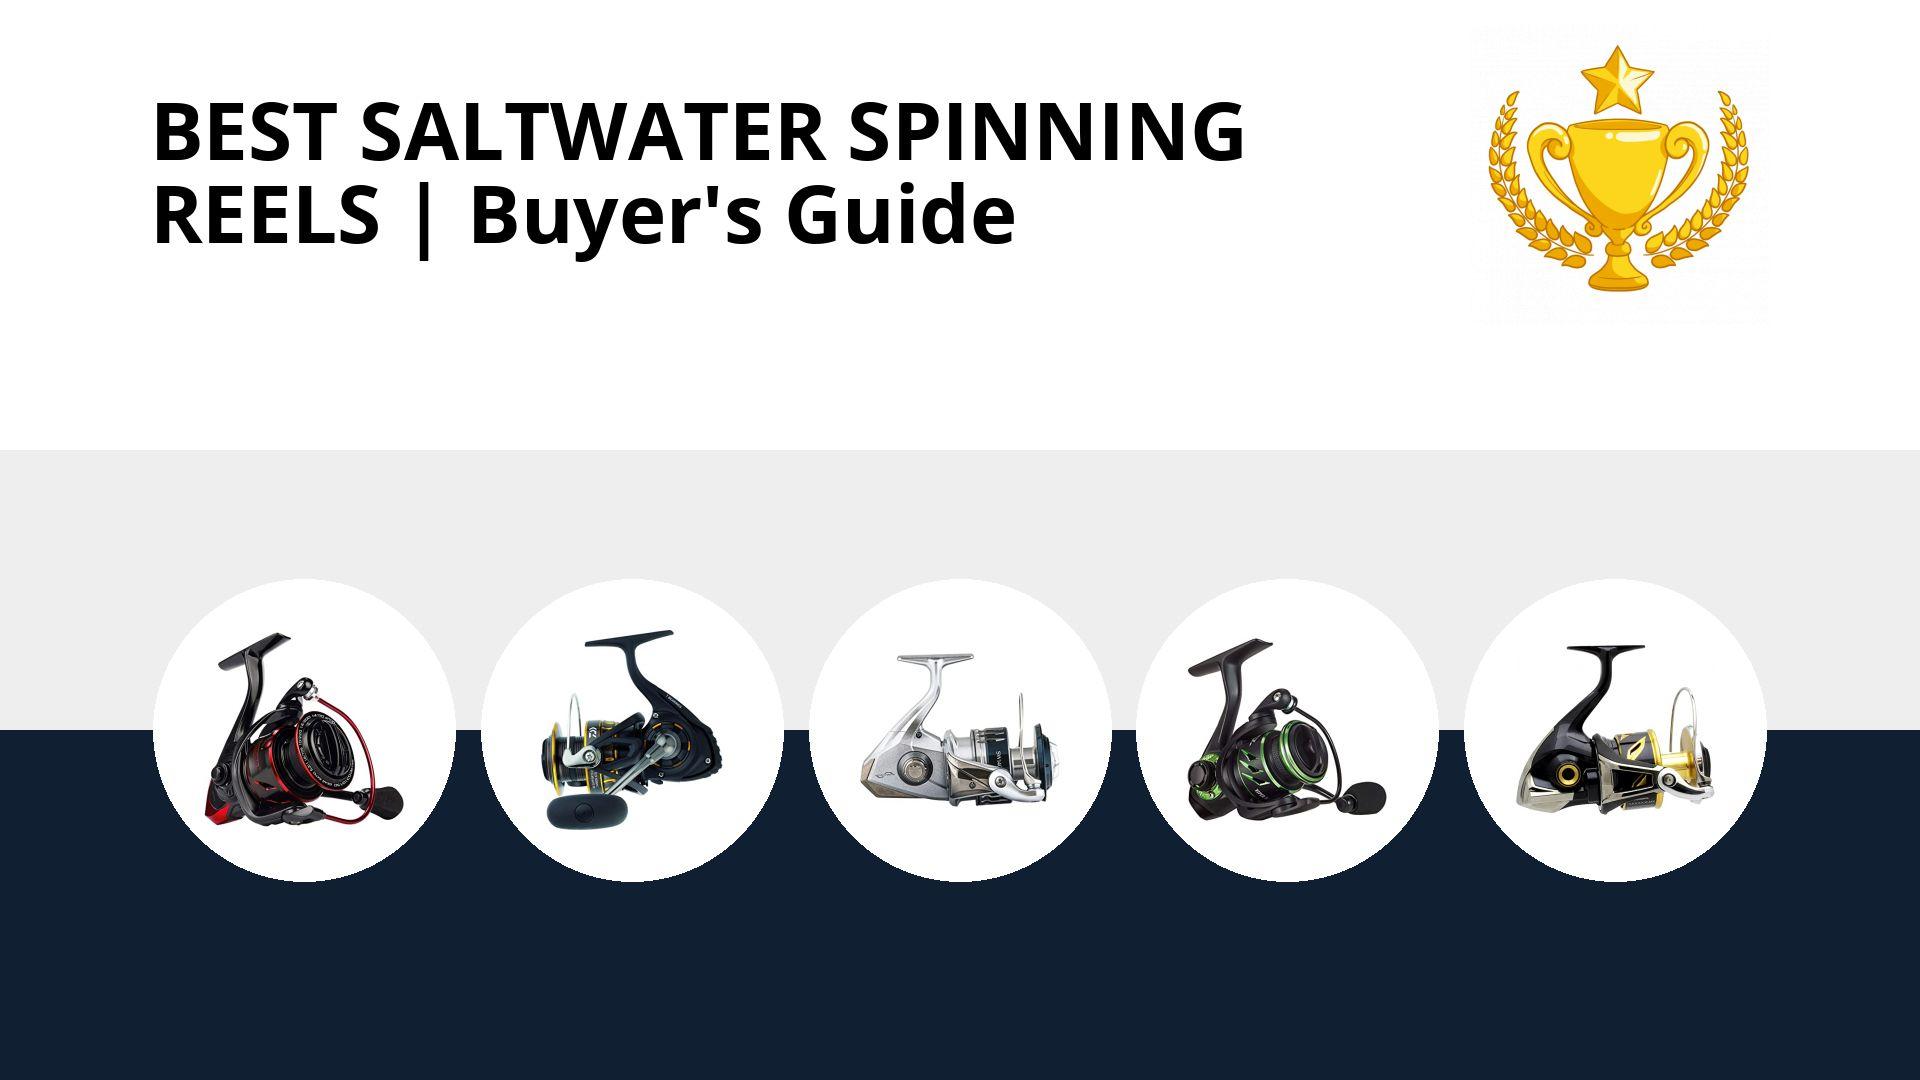 Best Saltwater Spinning Reels: image